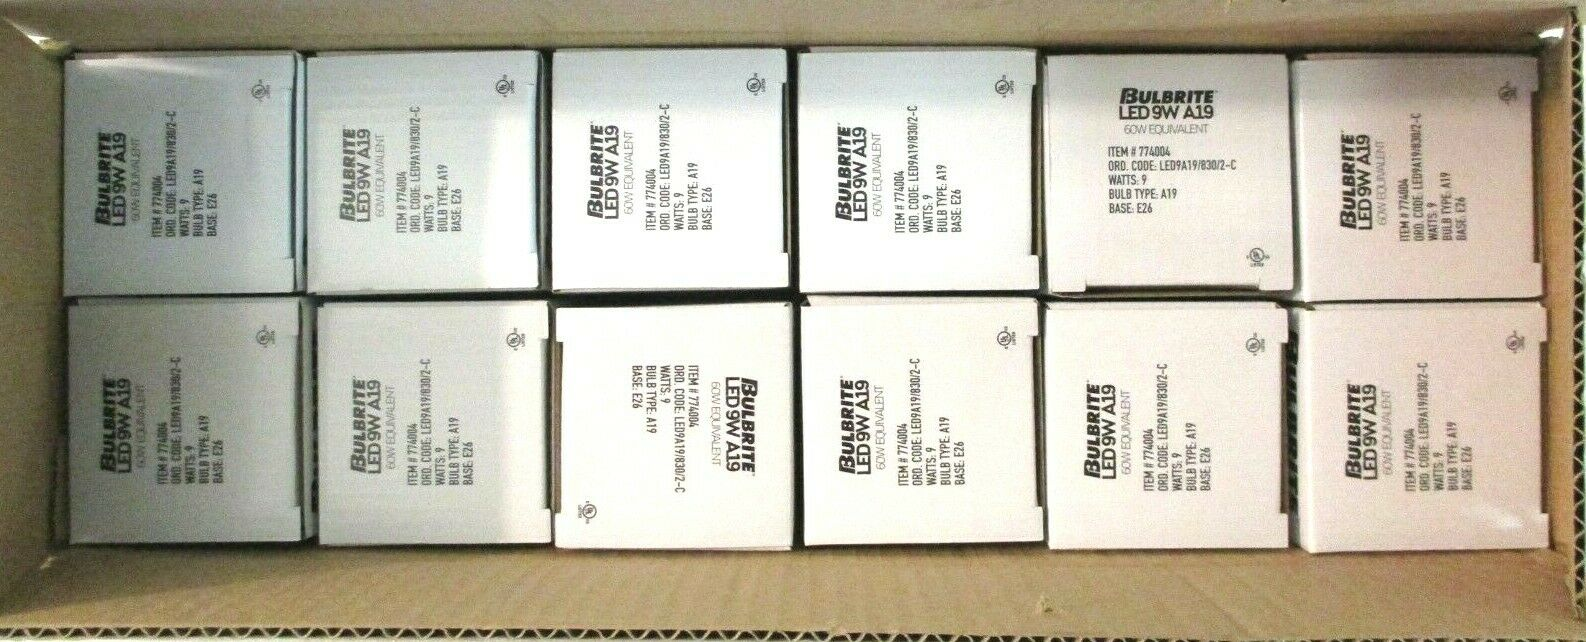 12 Bulbrite LED 9W A19//830//2-C Light Bulb Item #774004 ^